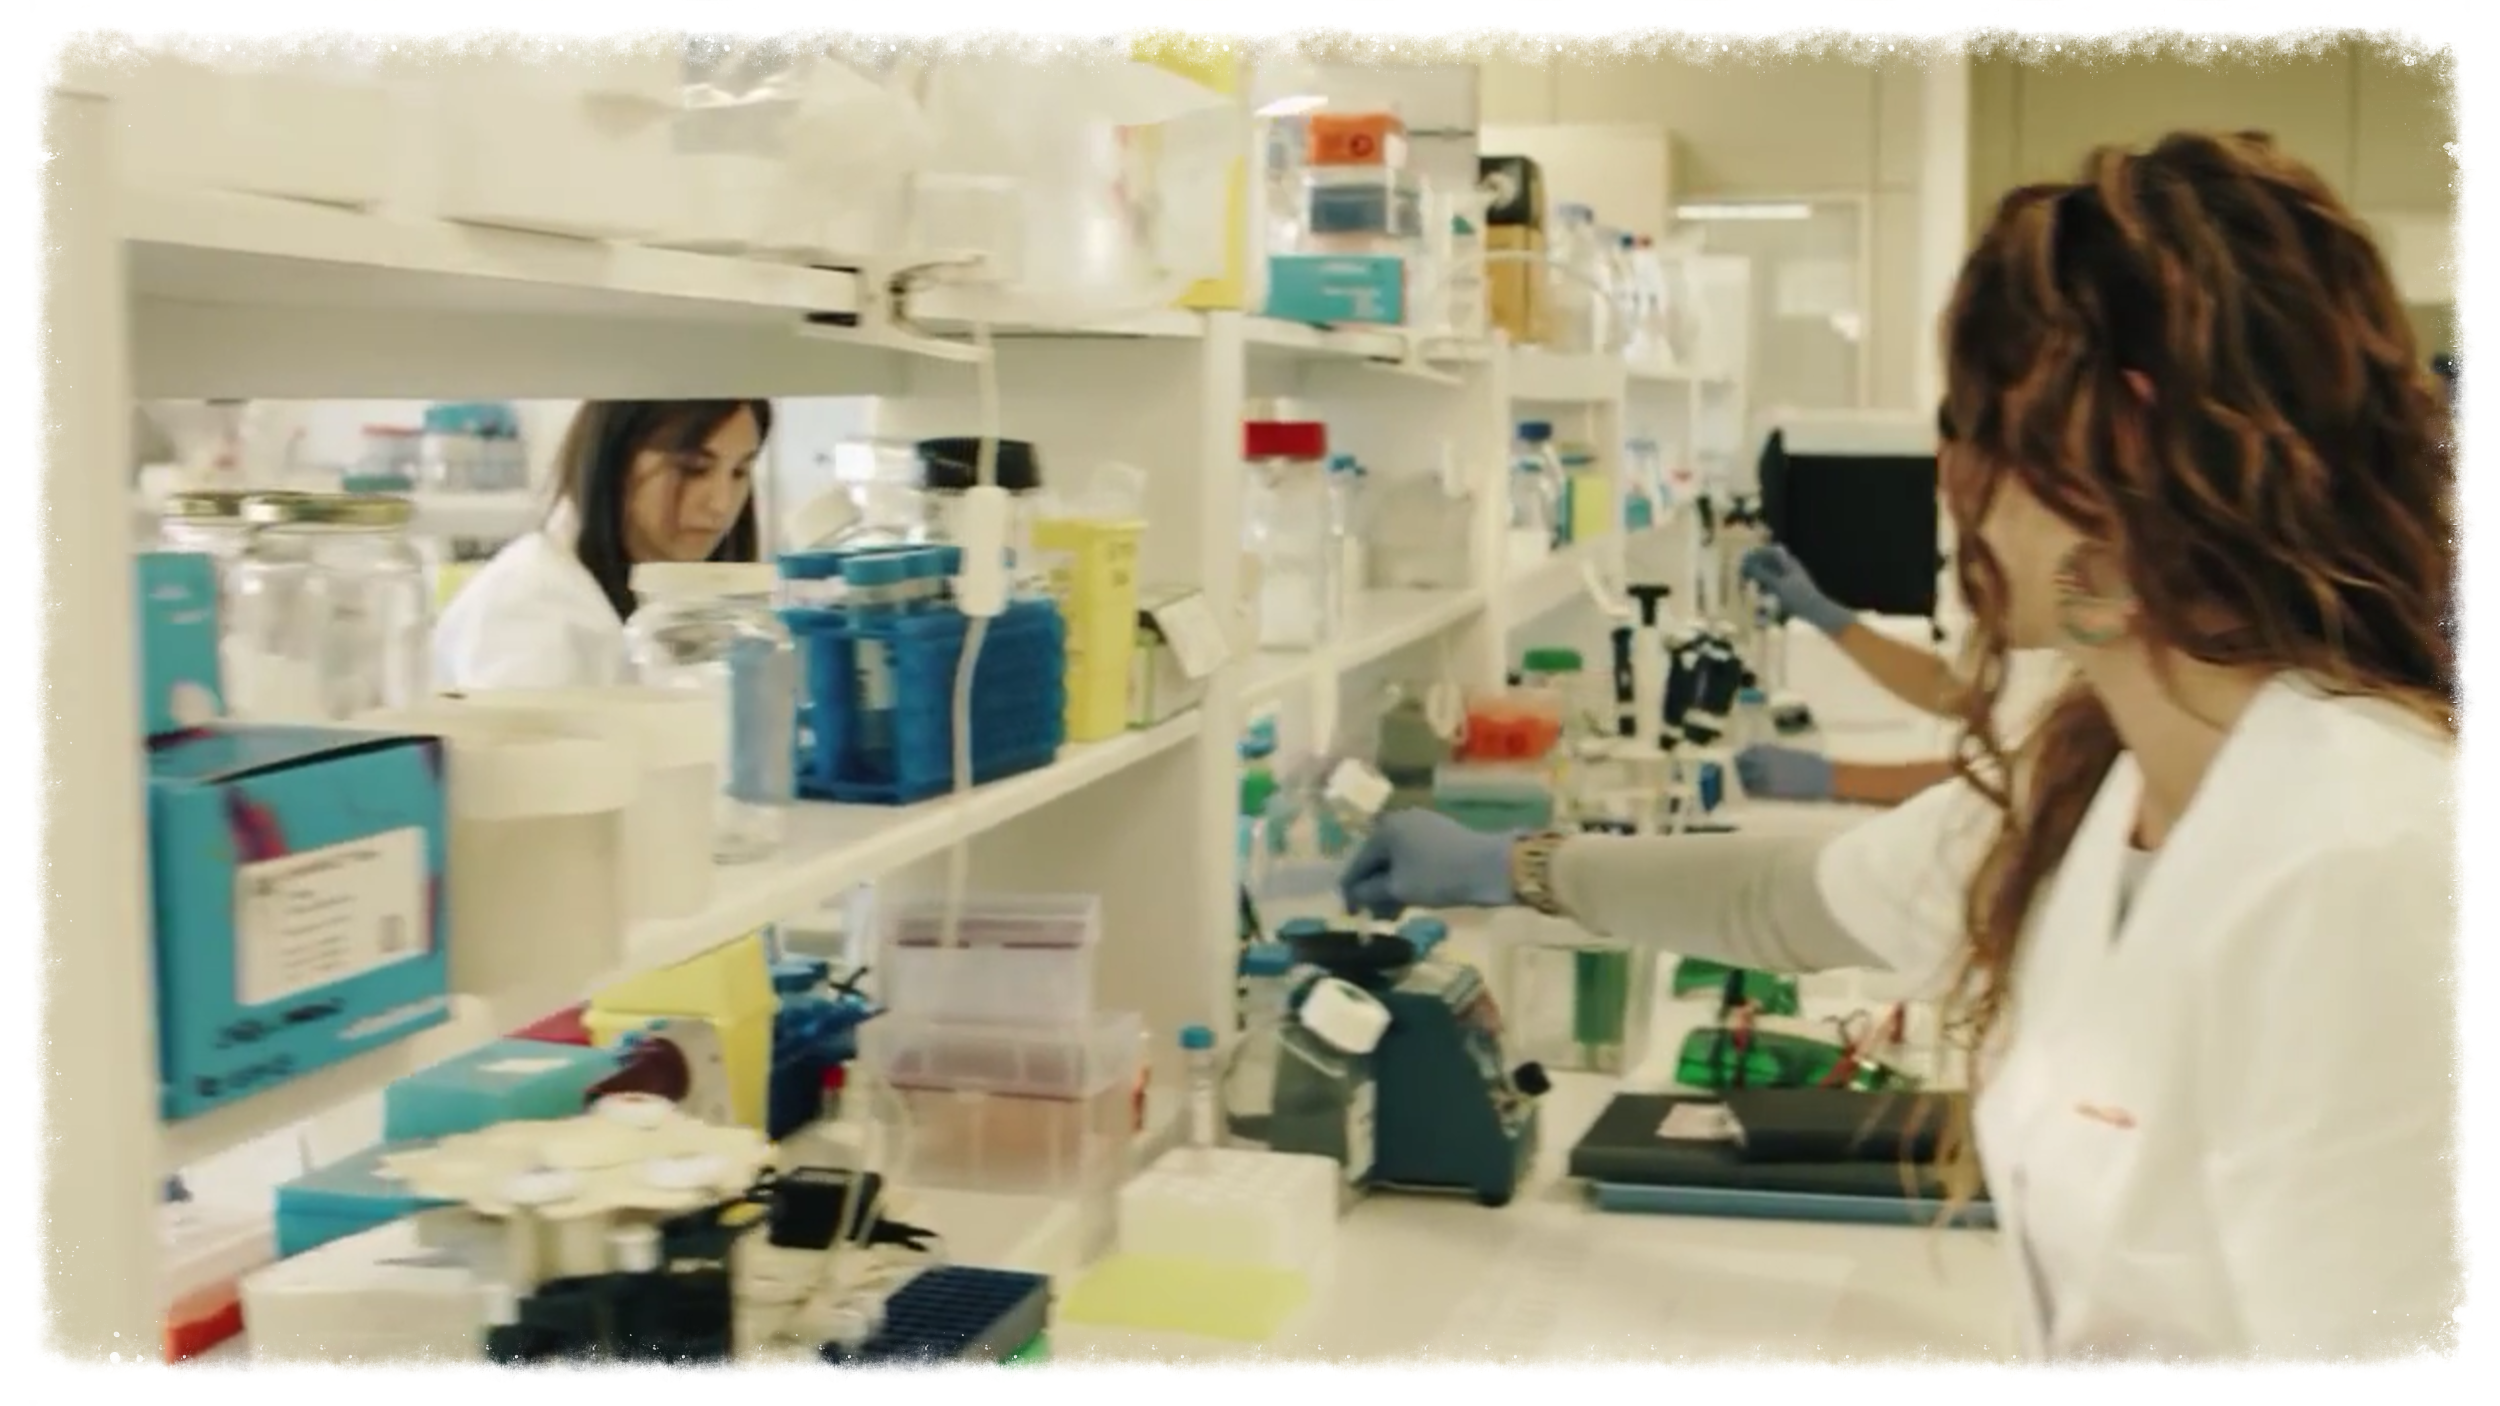 asociacion-anita-sant-joan-de-deu-research-foundation-investigacion-tumor-celulas-germinales-germ-cell-tumor-research-jaume-mora-james-amatruda